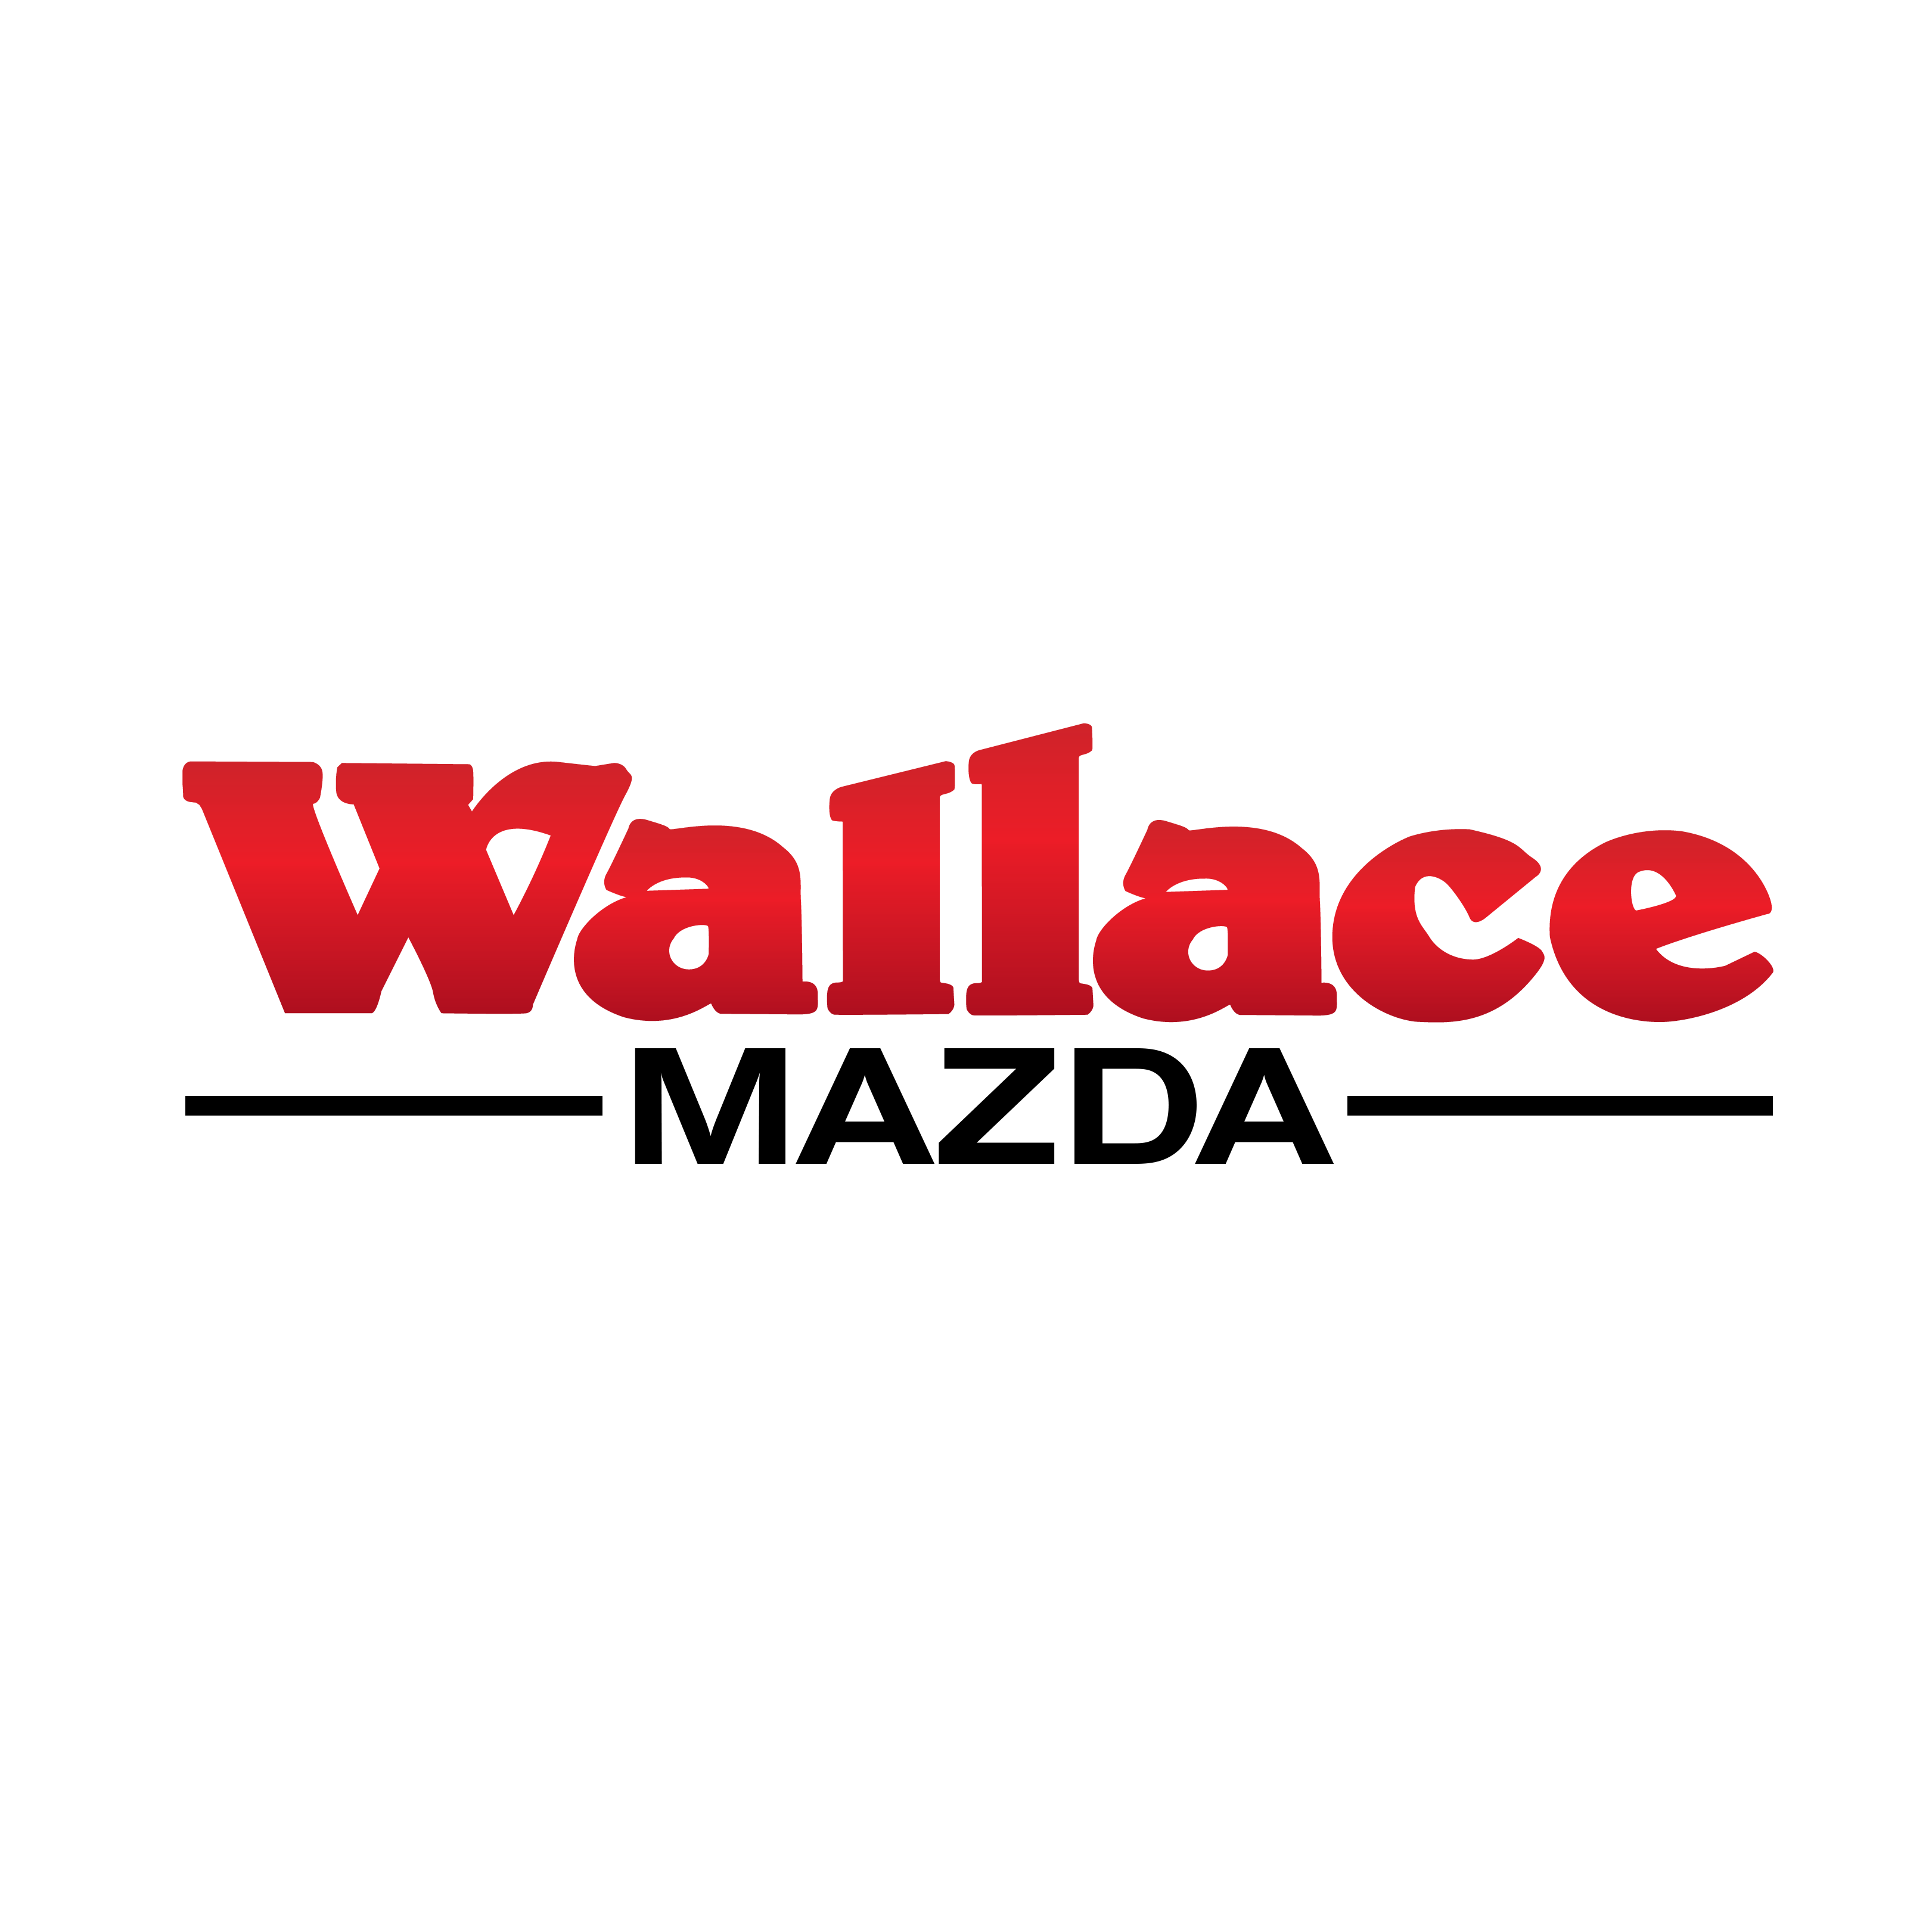 Wallace Chevrolet Stuart Fl >> Wallace Mazda, Stuart Florida (FL) - LocalDatabase.com